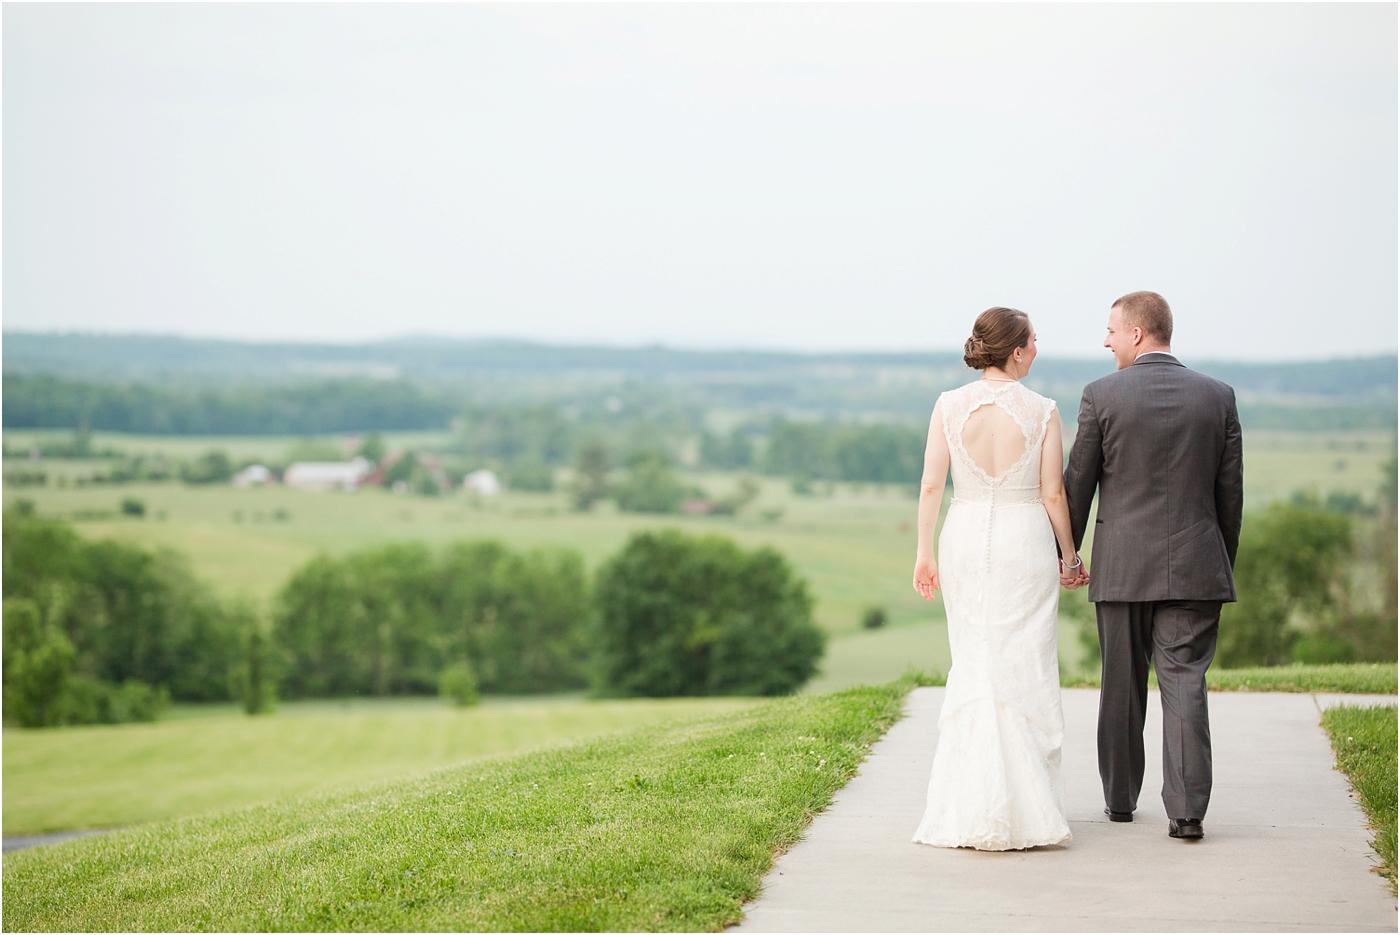 Gettysburg-lodges-wedding-photos-99.jpg